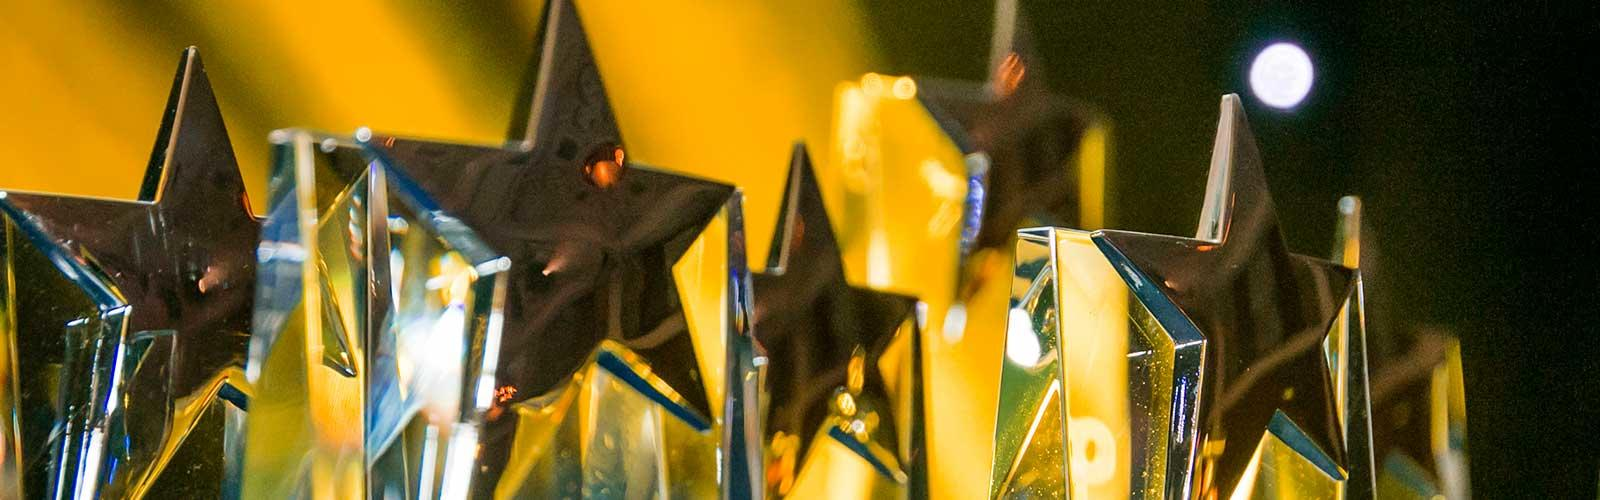 APPC15 Awards (img_2807)_web_awards_page banner.jpg